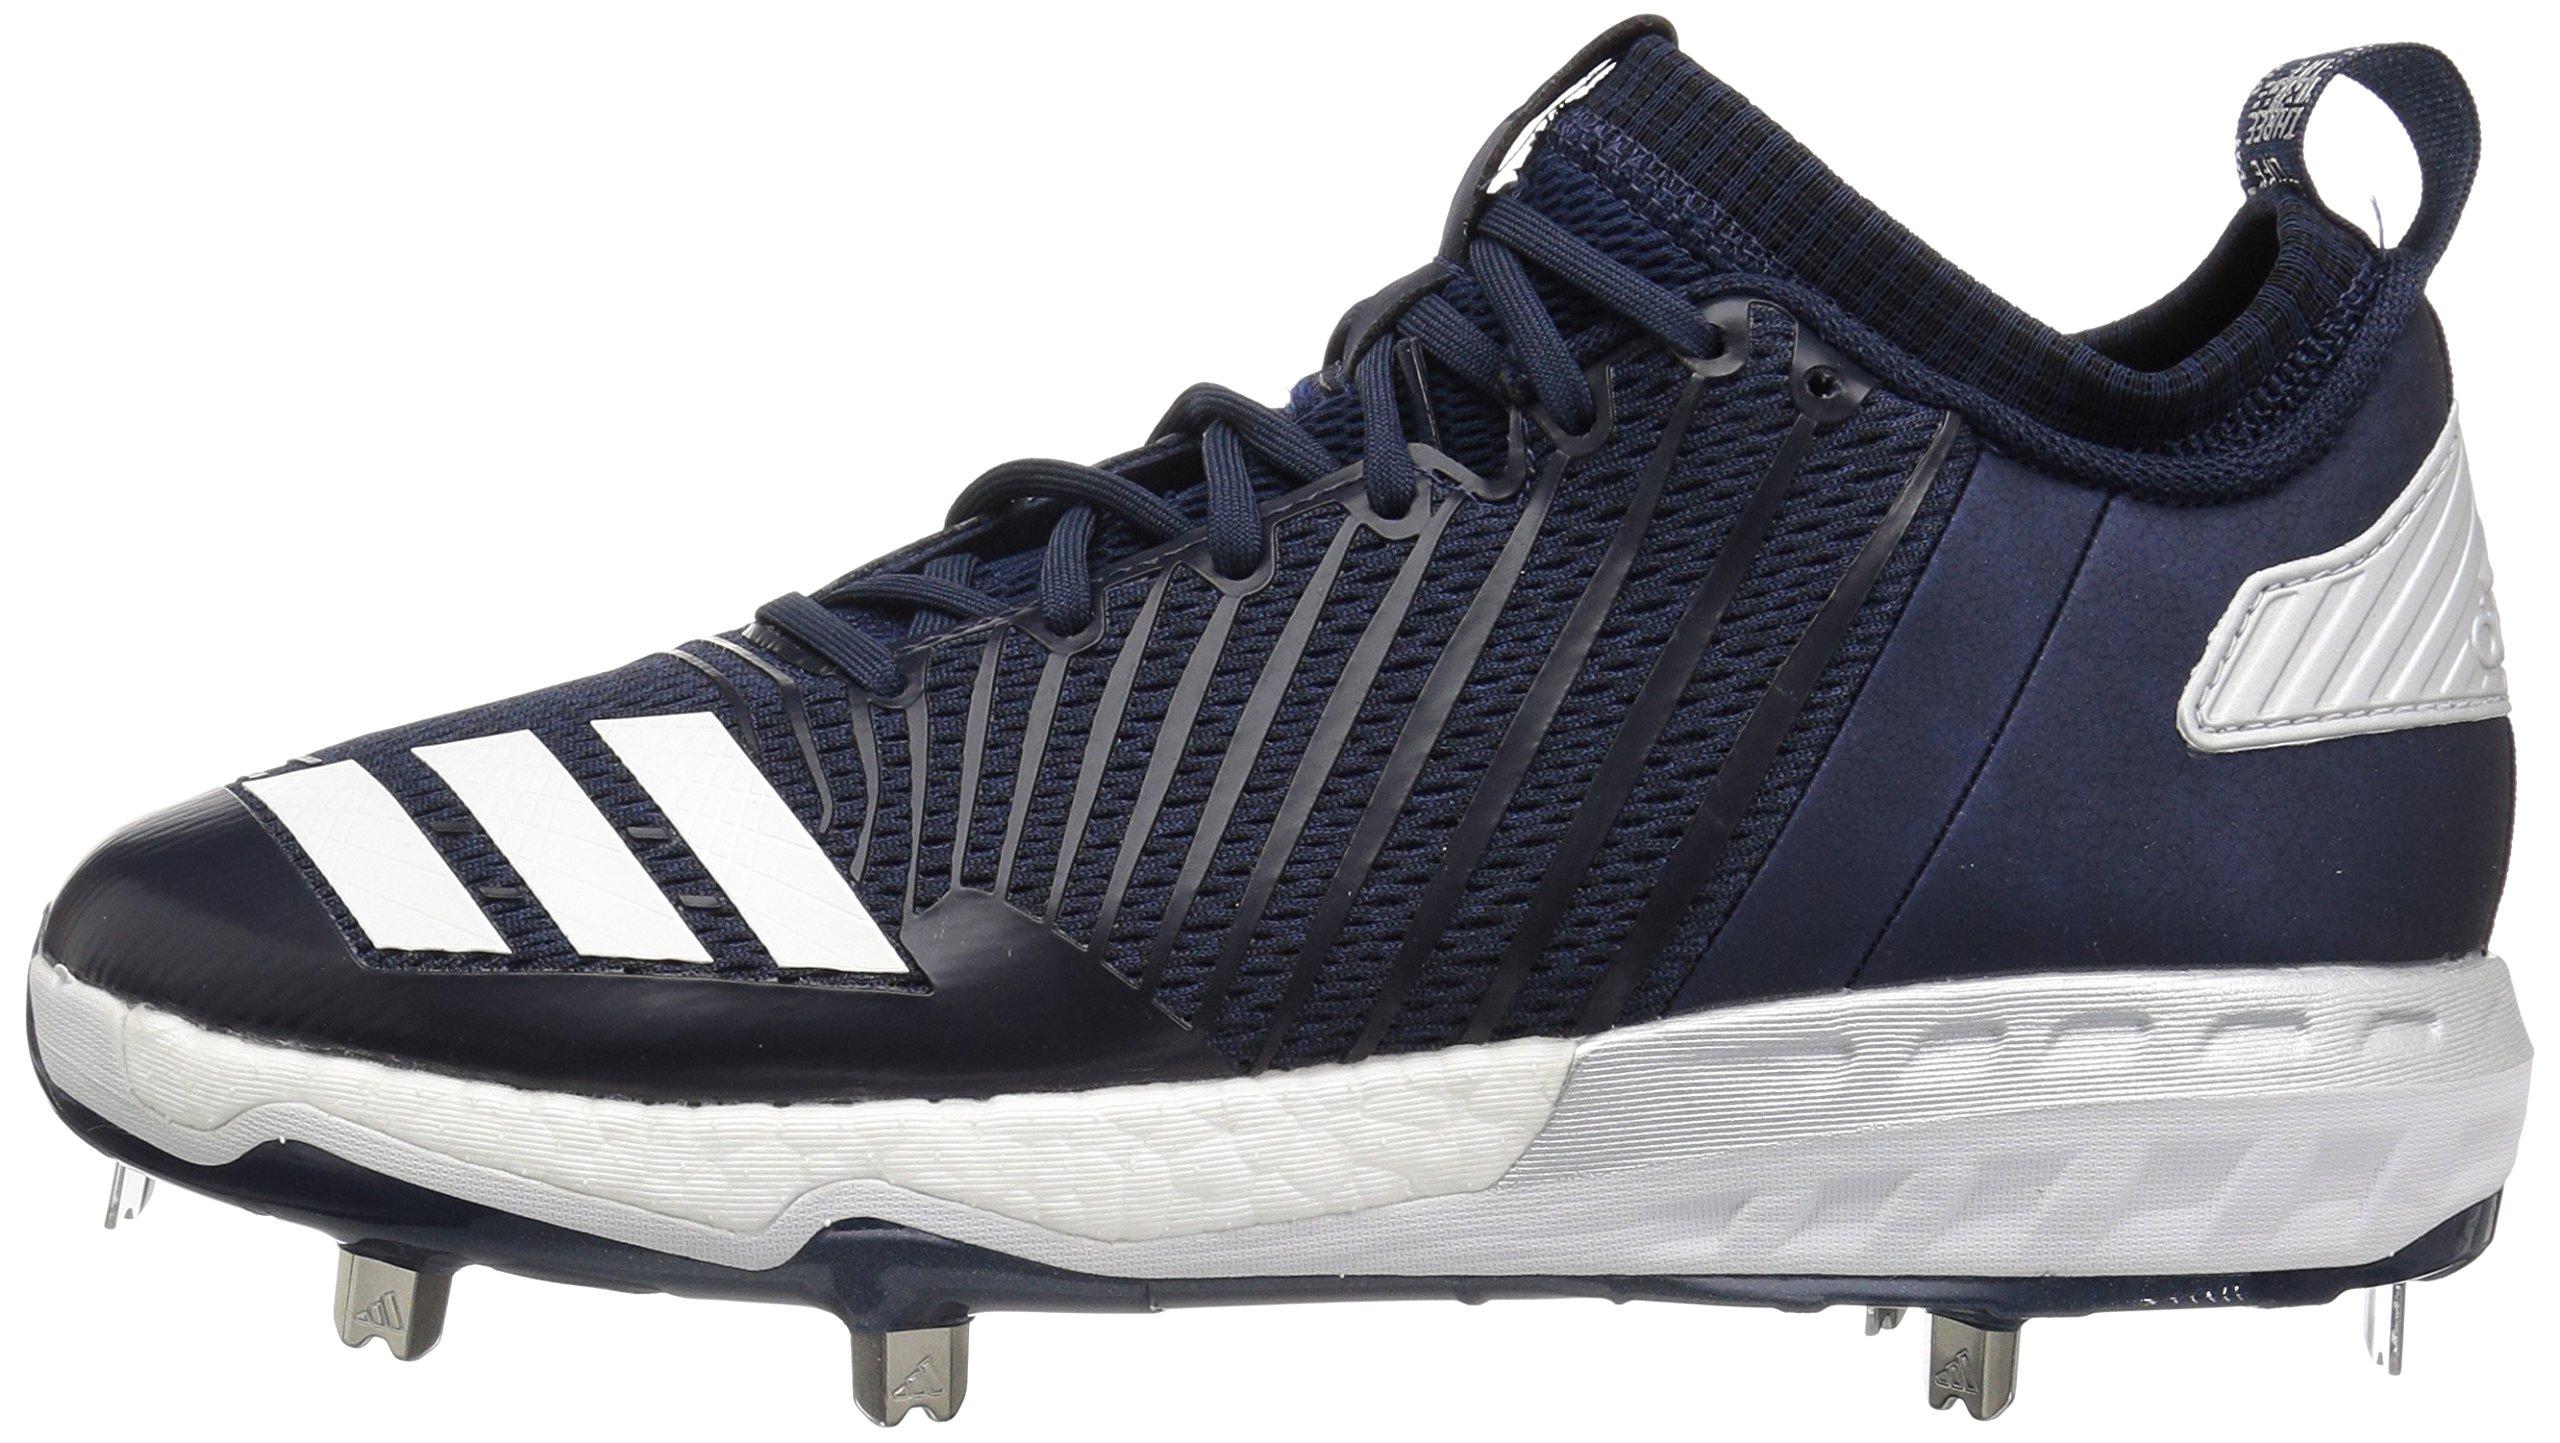 adidas Men's Freak X Carbon Mid Baseball Shoe, Collegiate Navy/White/Metallic Silver, 8 Medium US by adidas (Image #5)